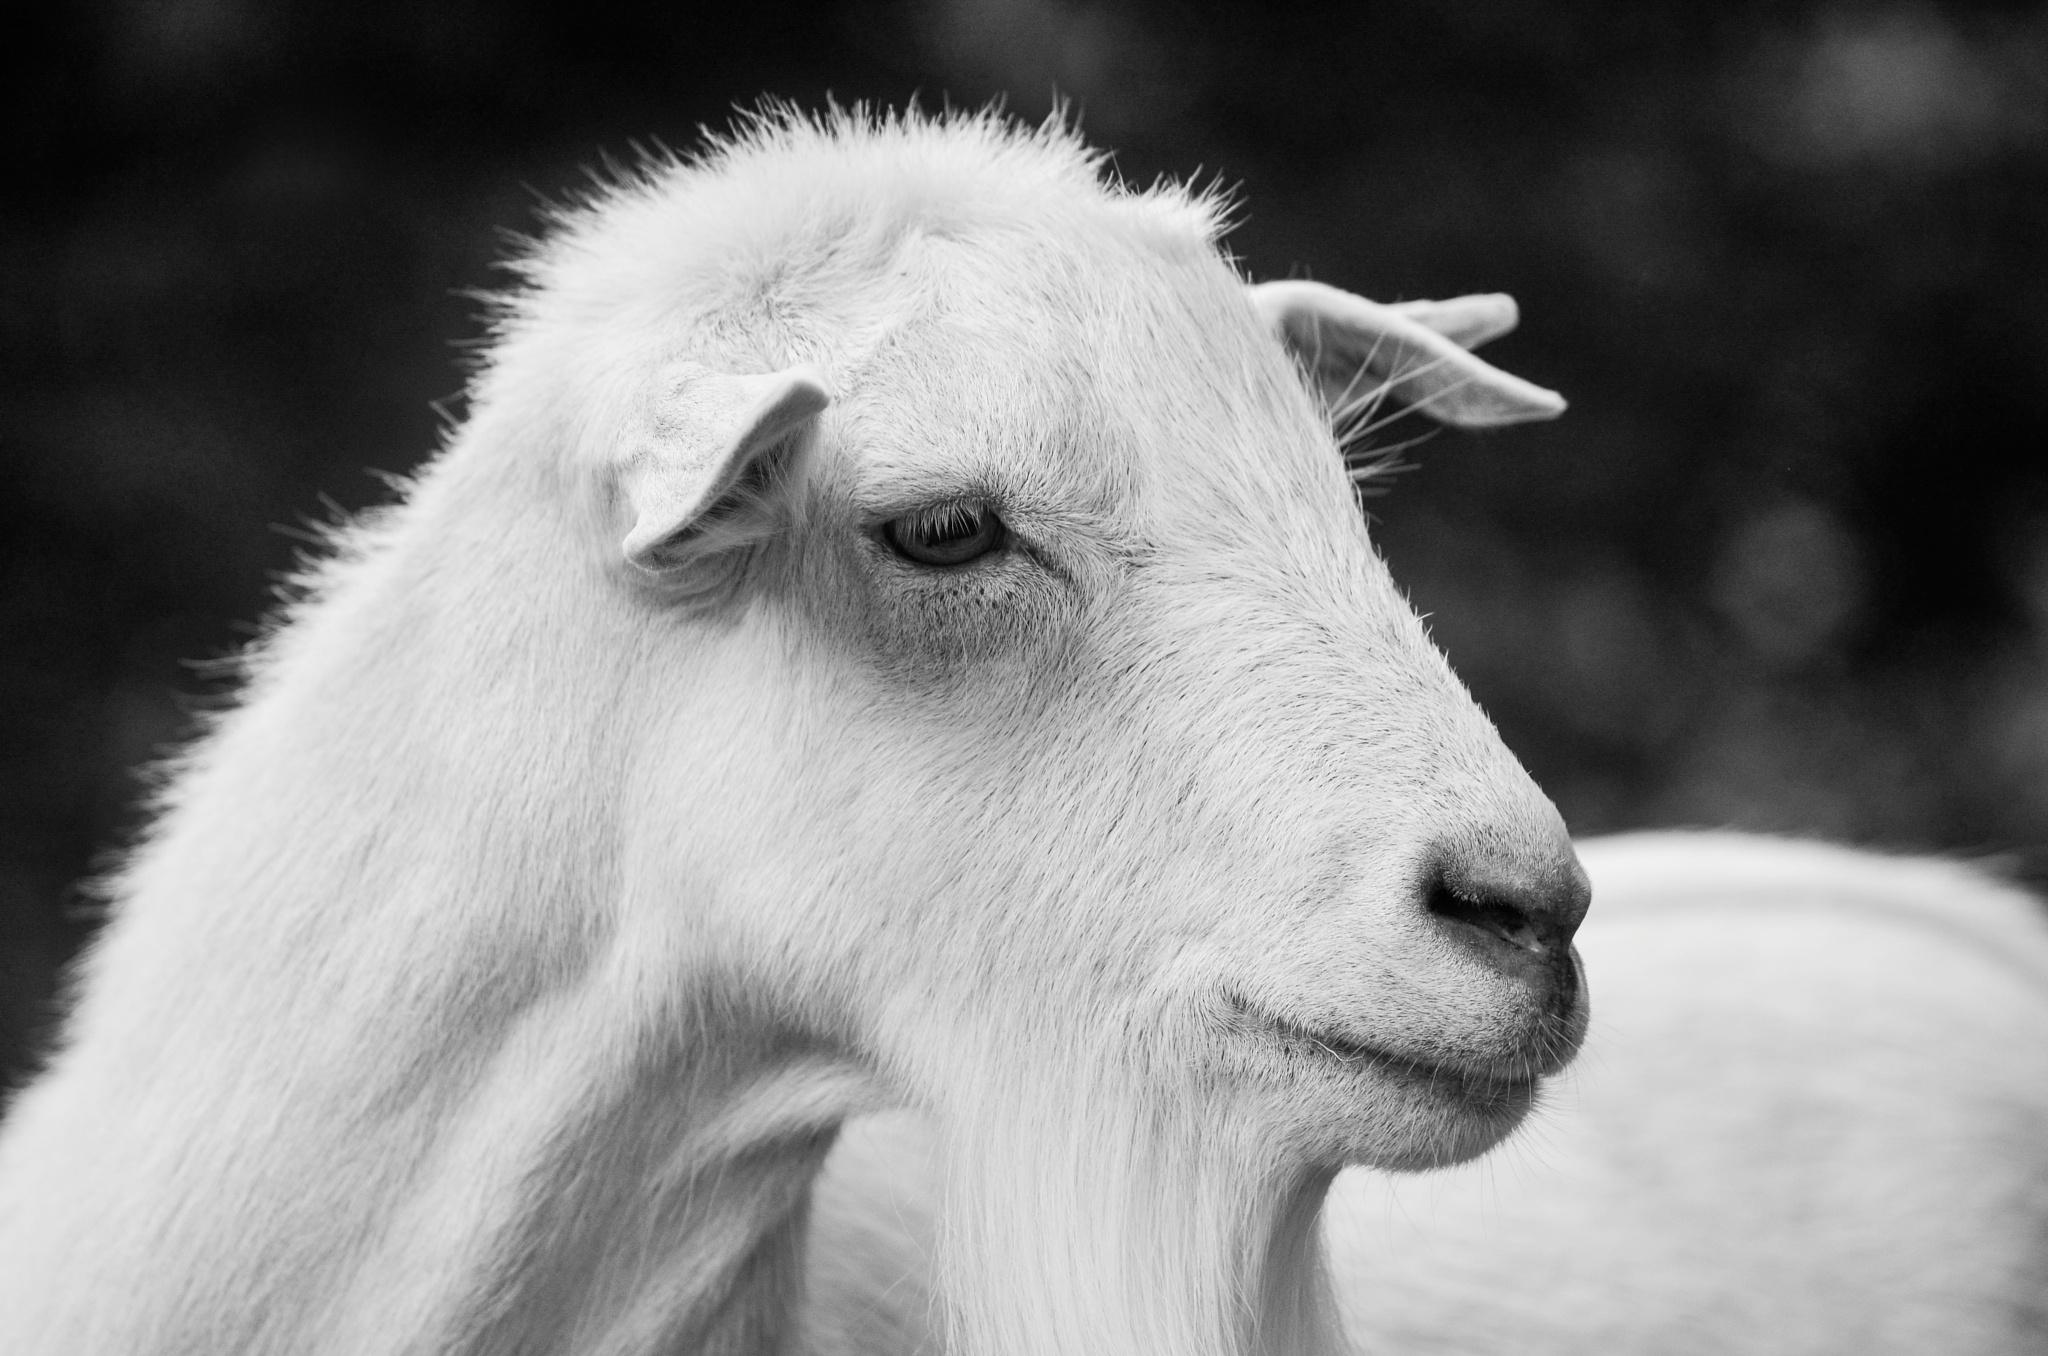 Domestic Goat by Julija M.